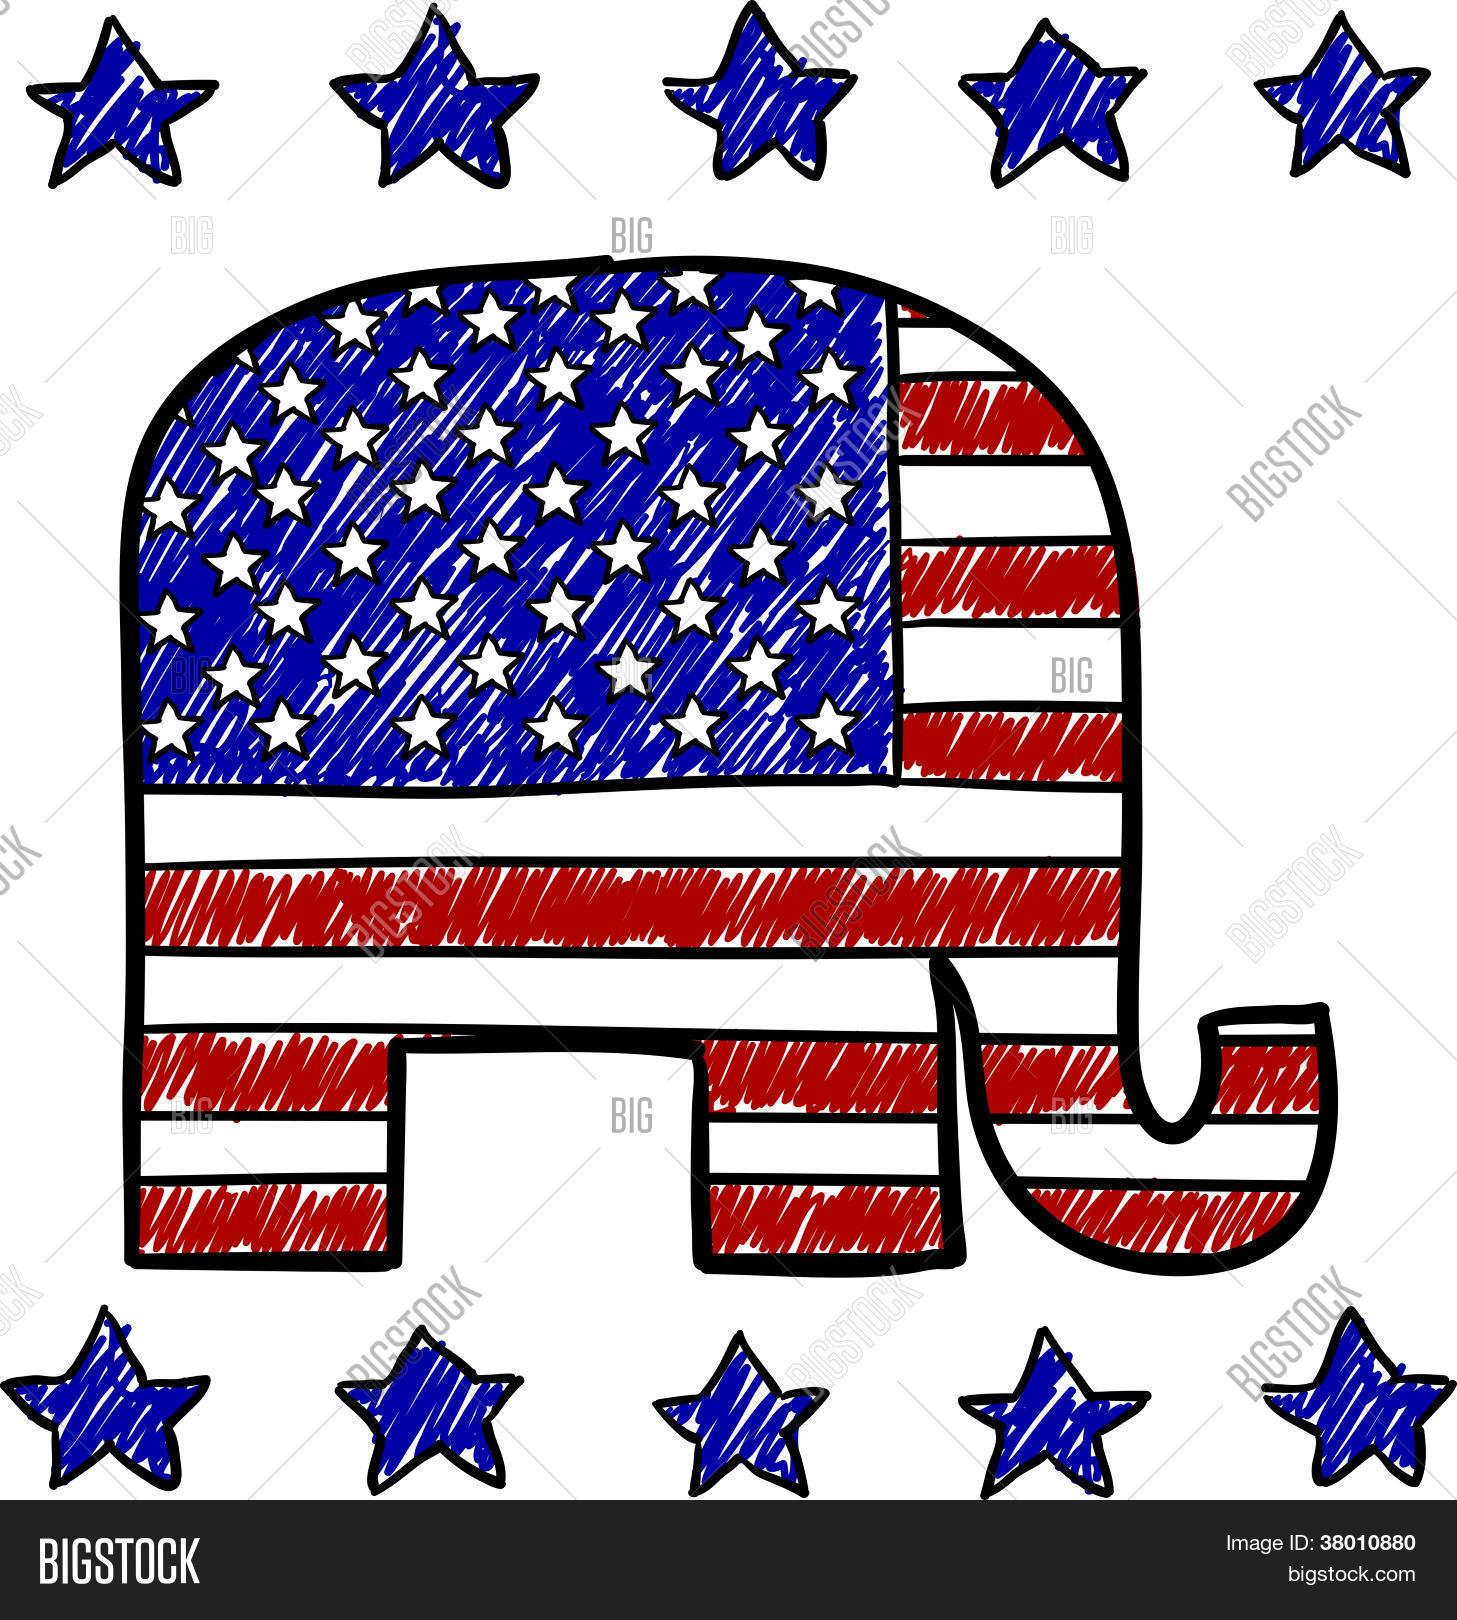 Republican Party Vector & Photo (Free Trial) | Bigstock